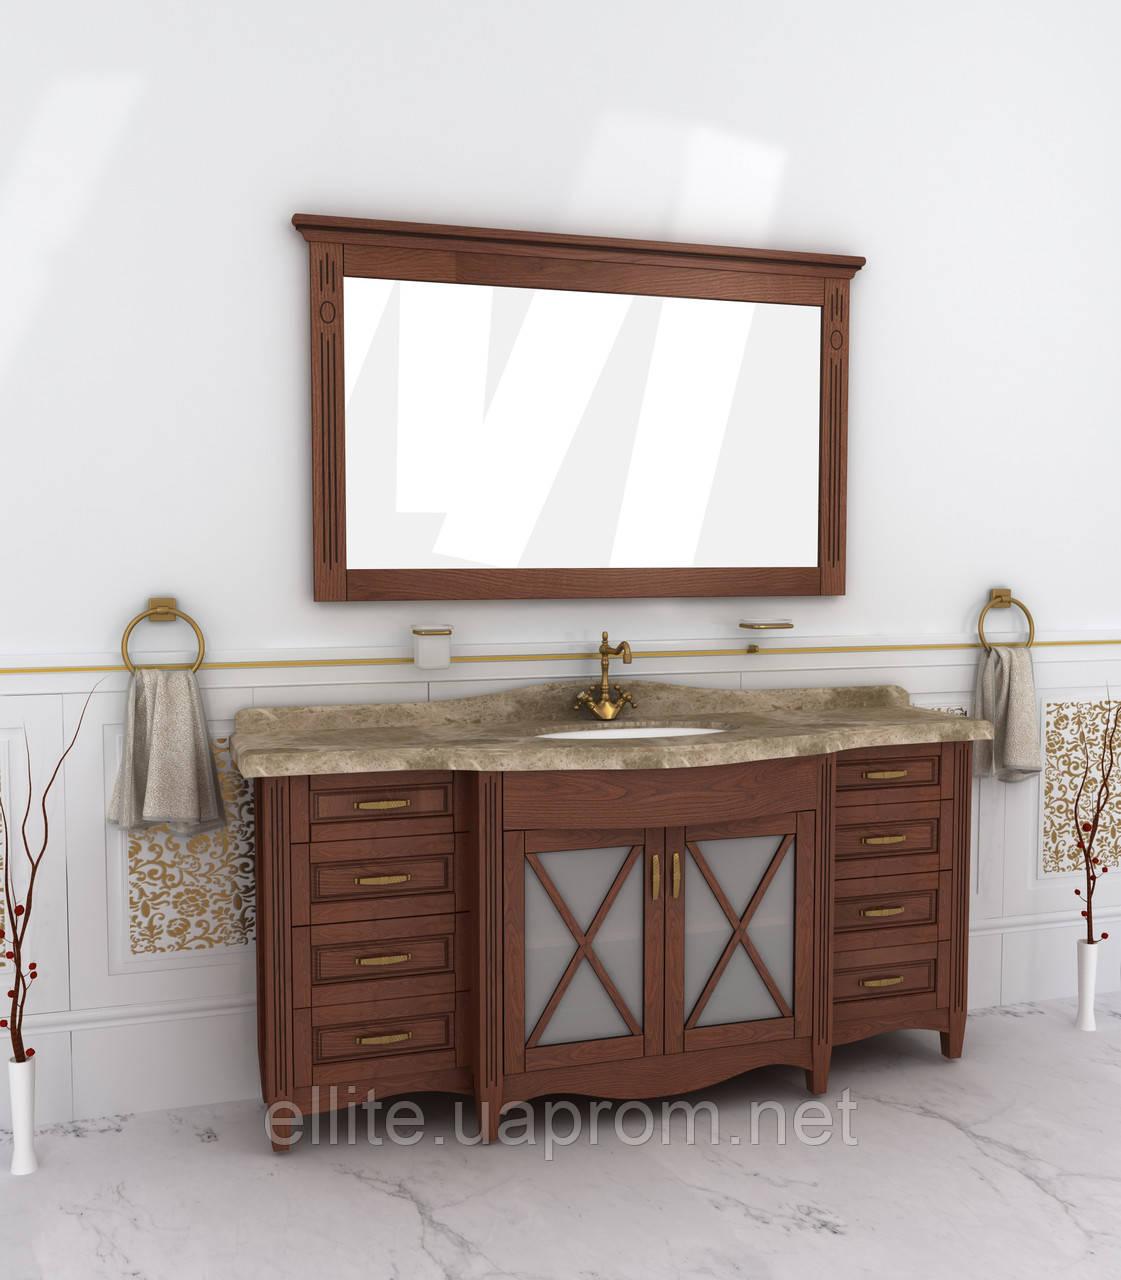 "Тумба и зеркало для ванной ""Аква-люкс"" 180"